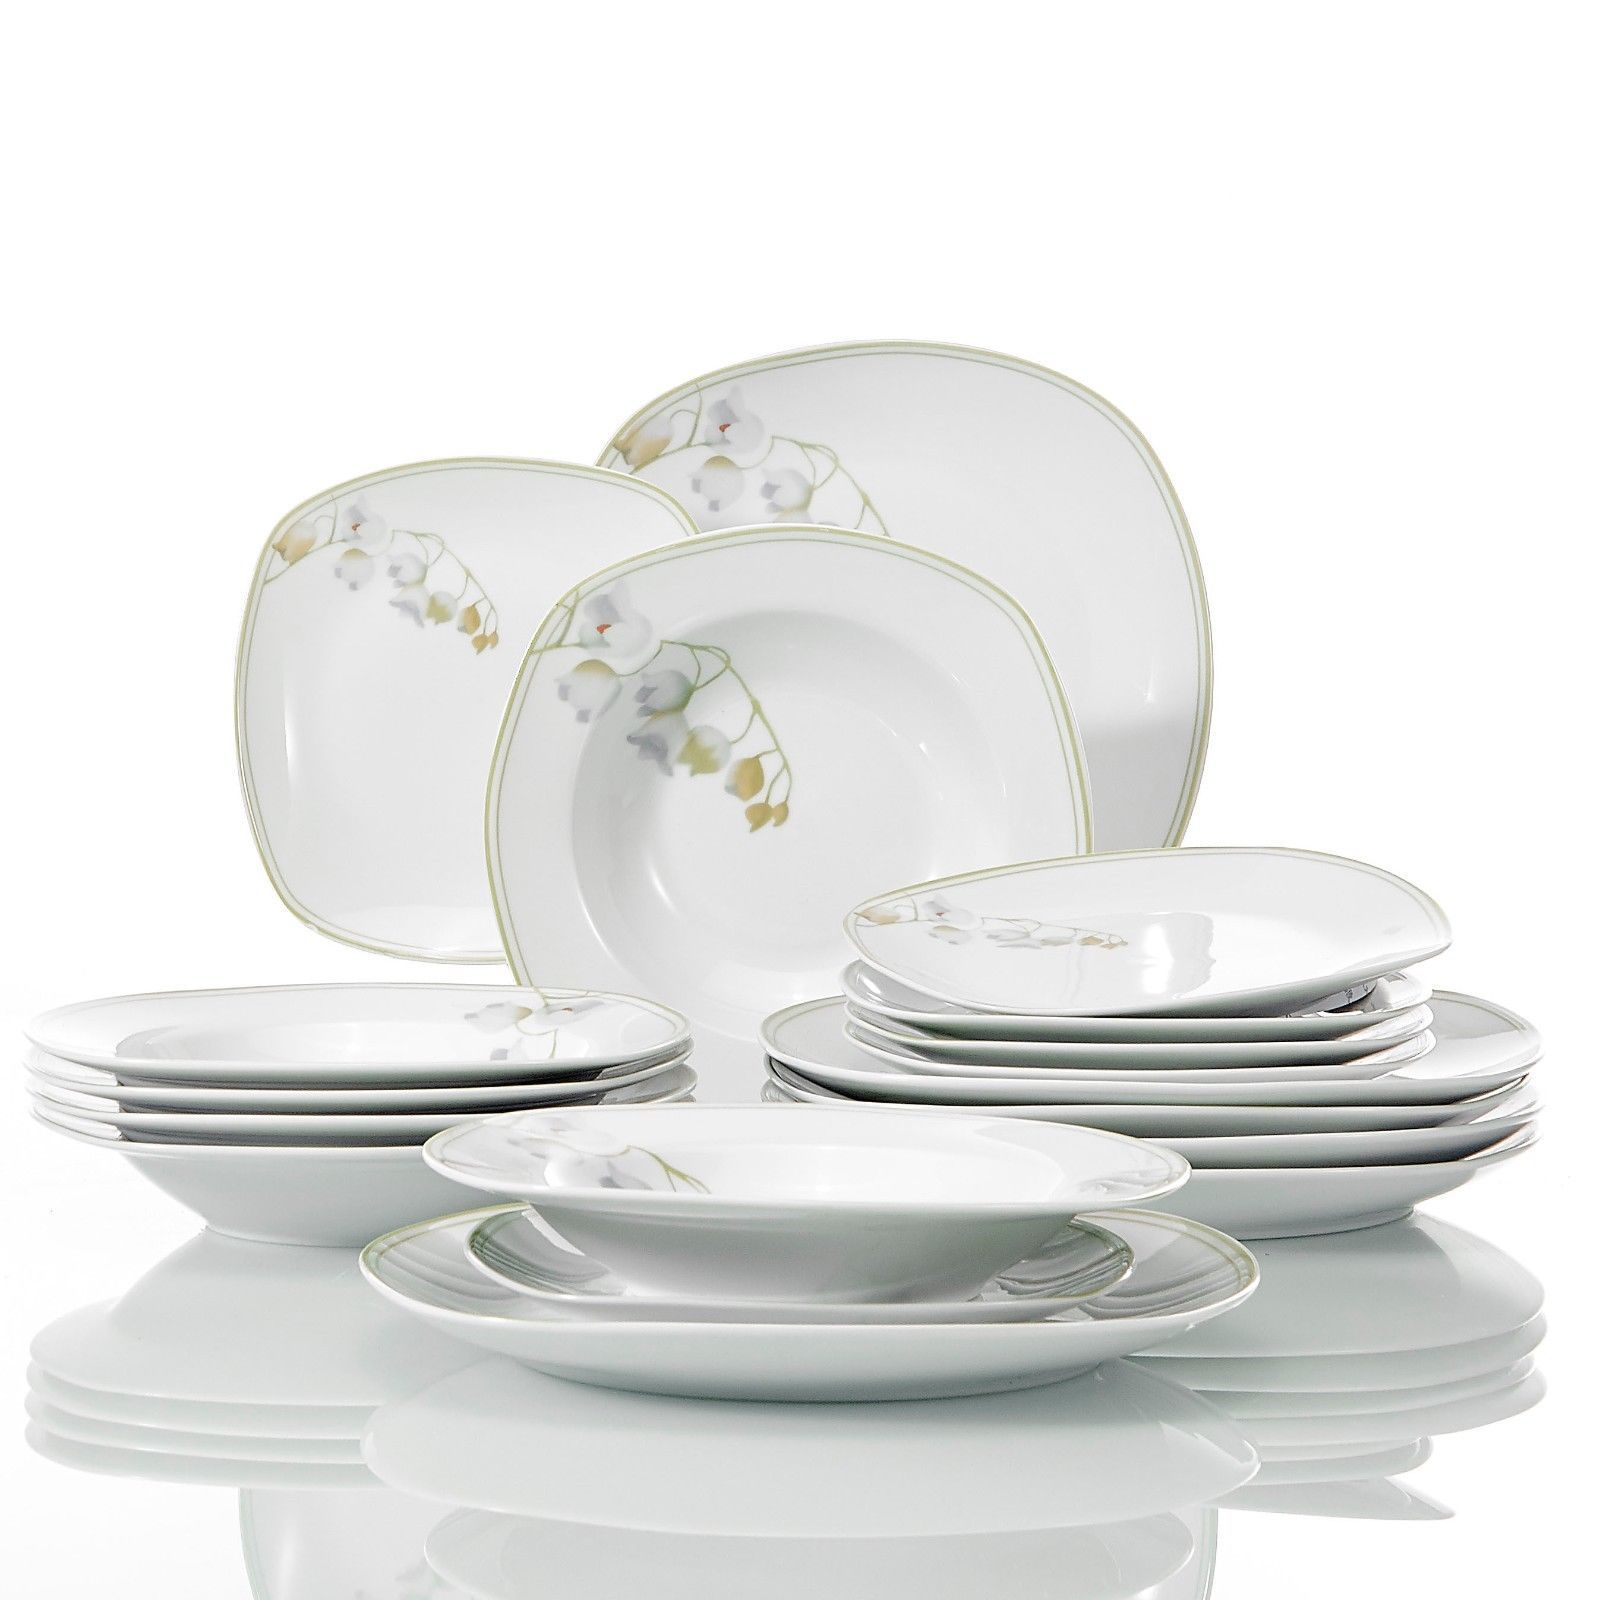 Veweet Nikita 30 Pieces Porcelain Dinner Set Tableware Soup Plate Cup Saucer 41 99 Tableware Dinner Sets Soup Dinner